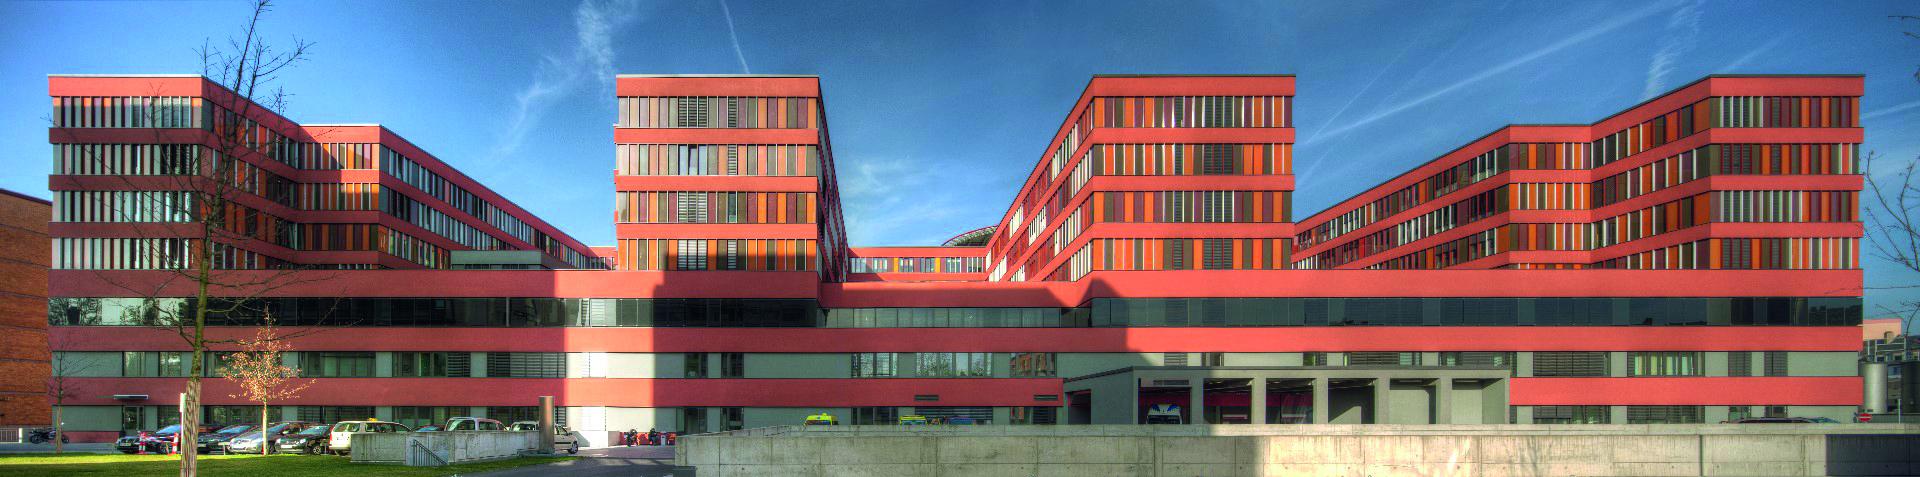 Klinikum Offenbach